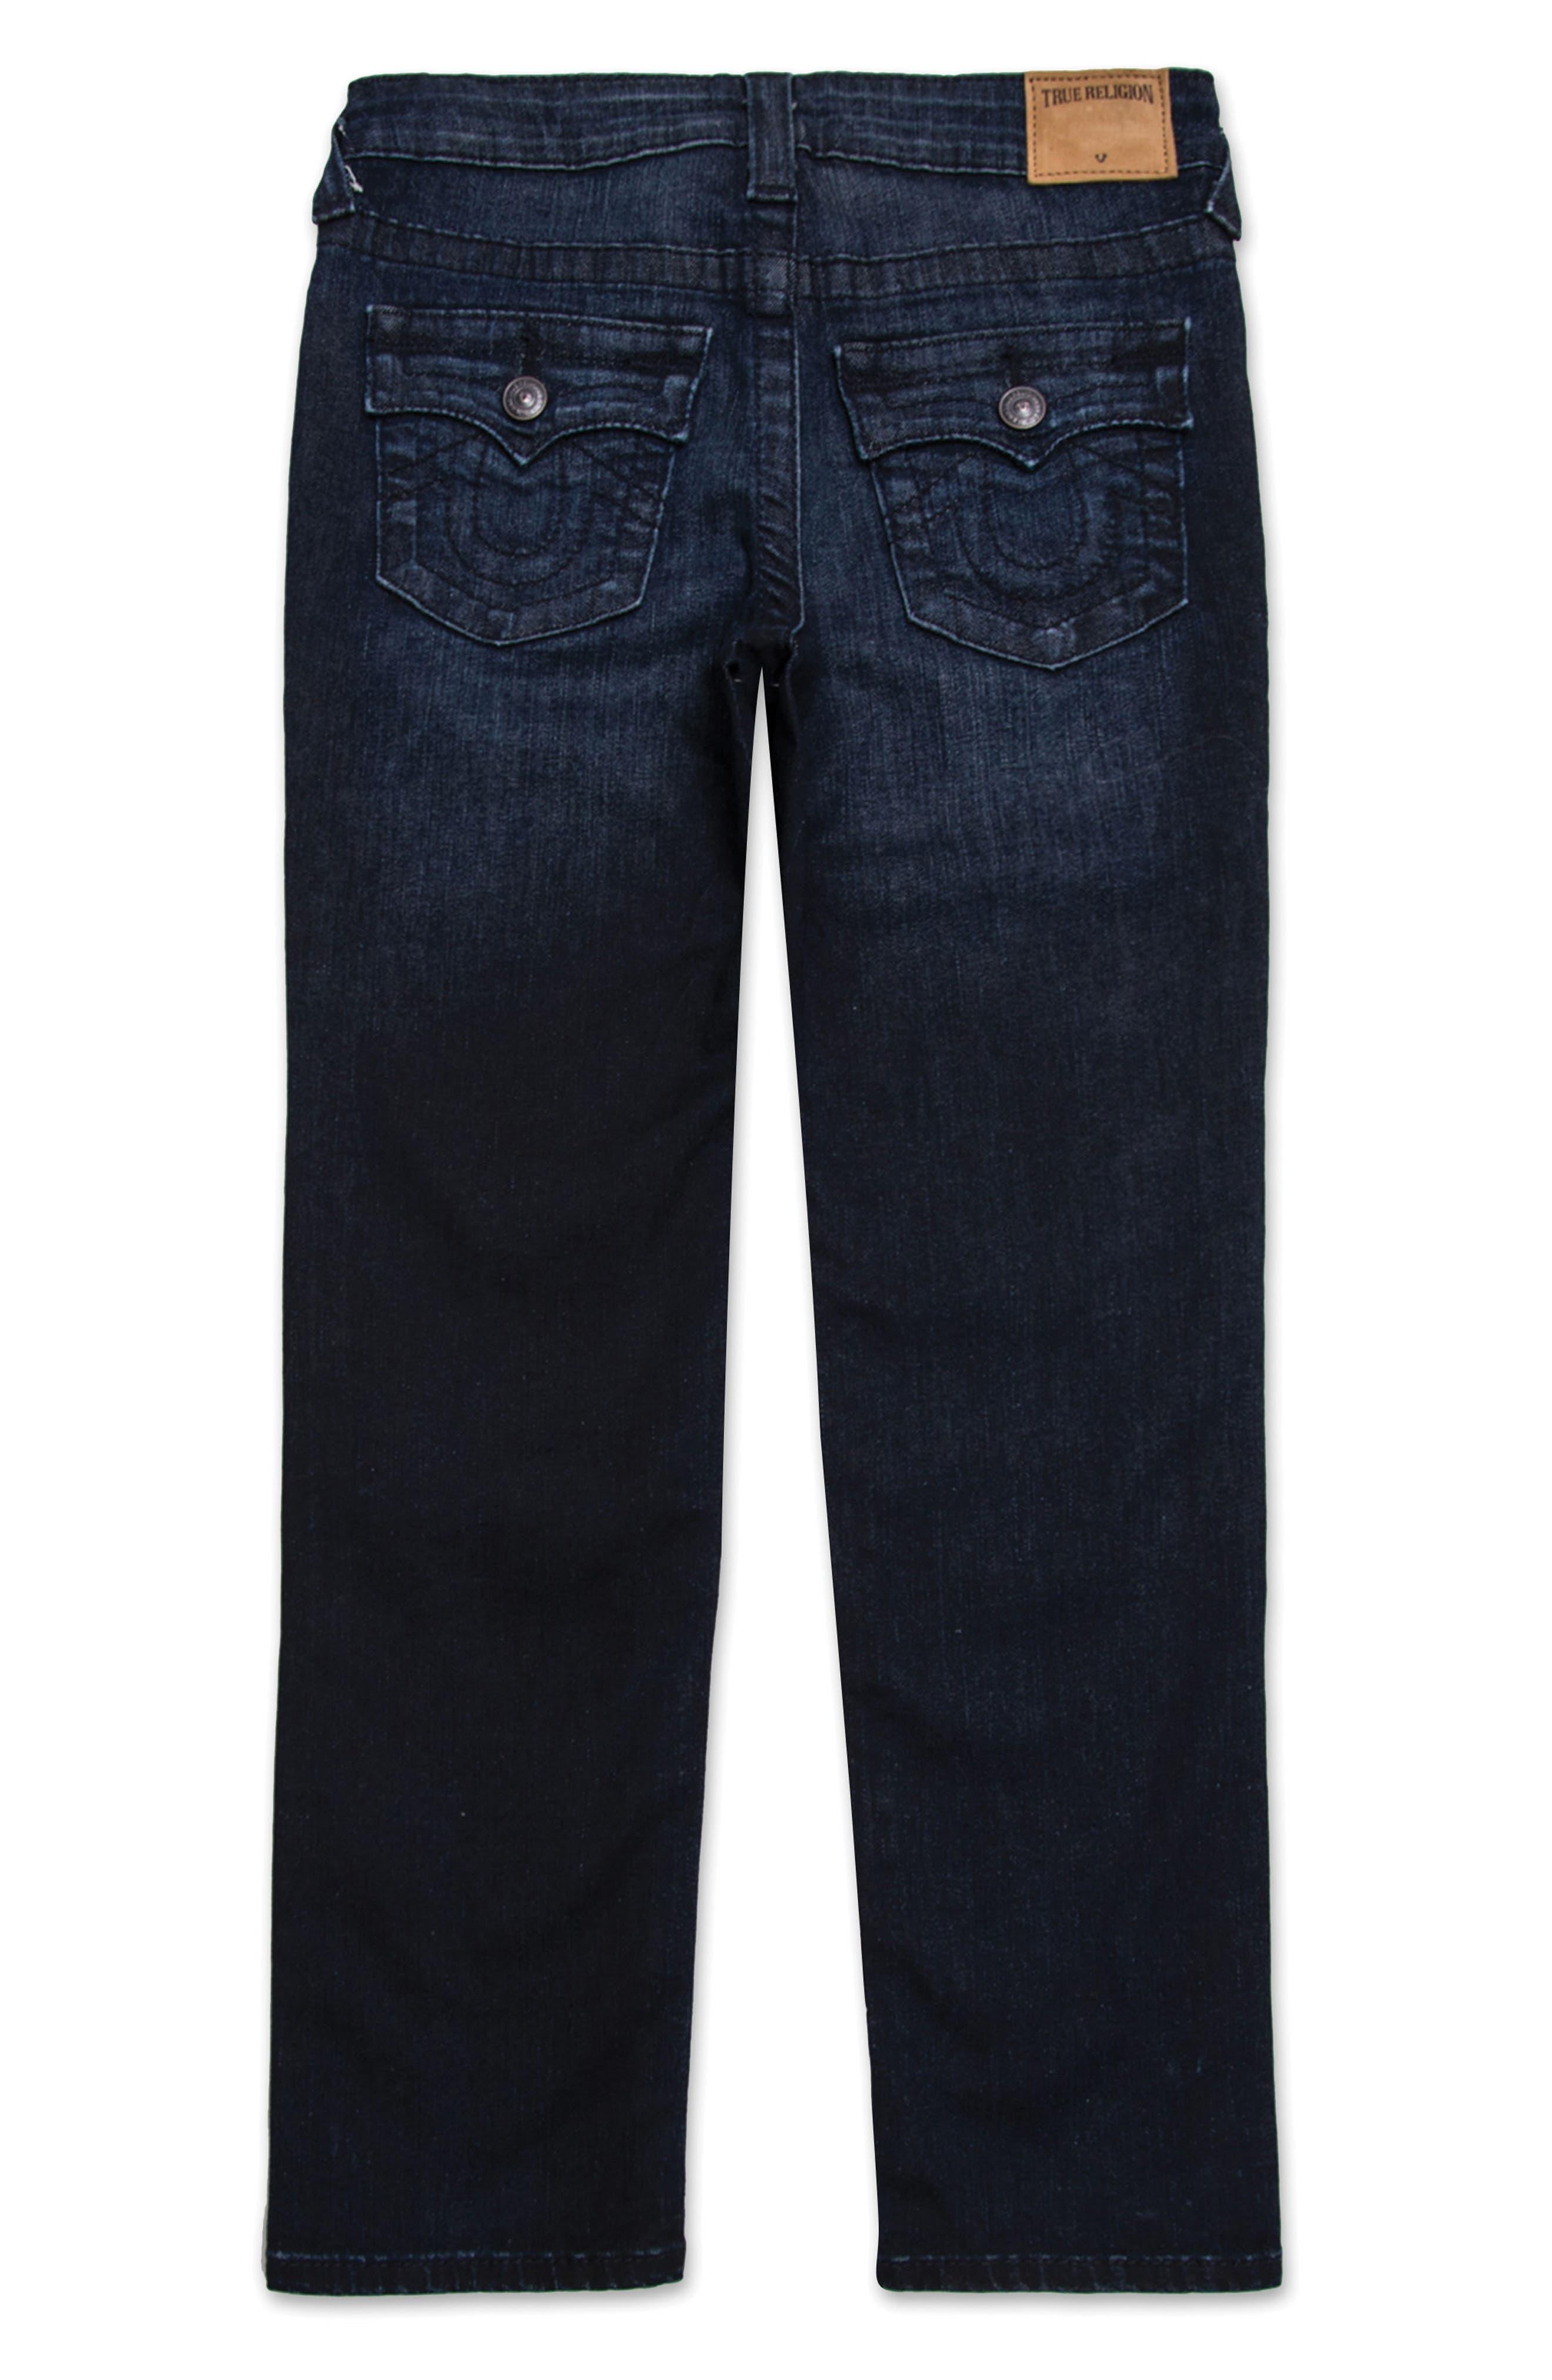 Geno Relaxed Slim Fit Jeans,                         Main,                         color, BLUE ASPHALT WASH